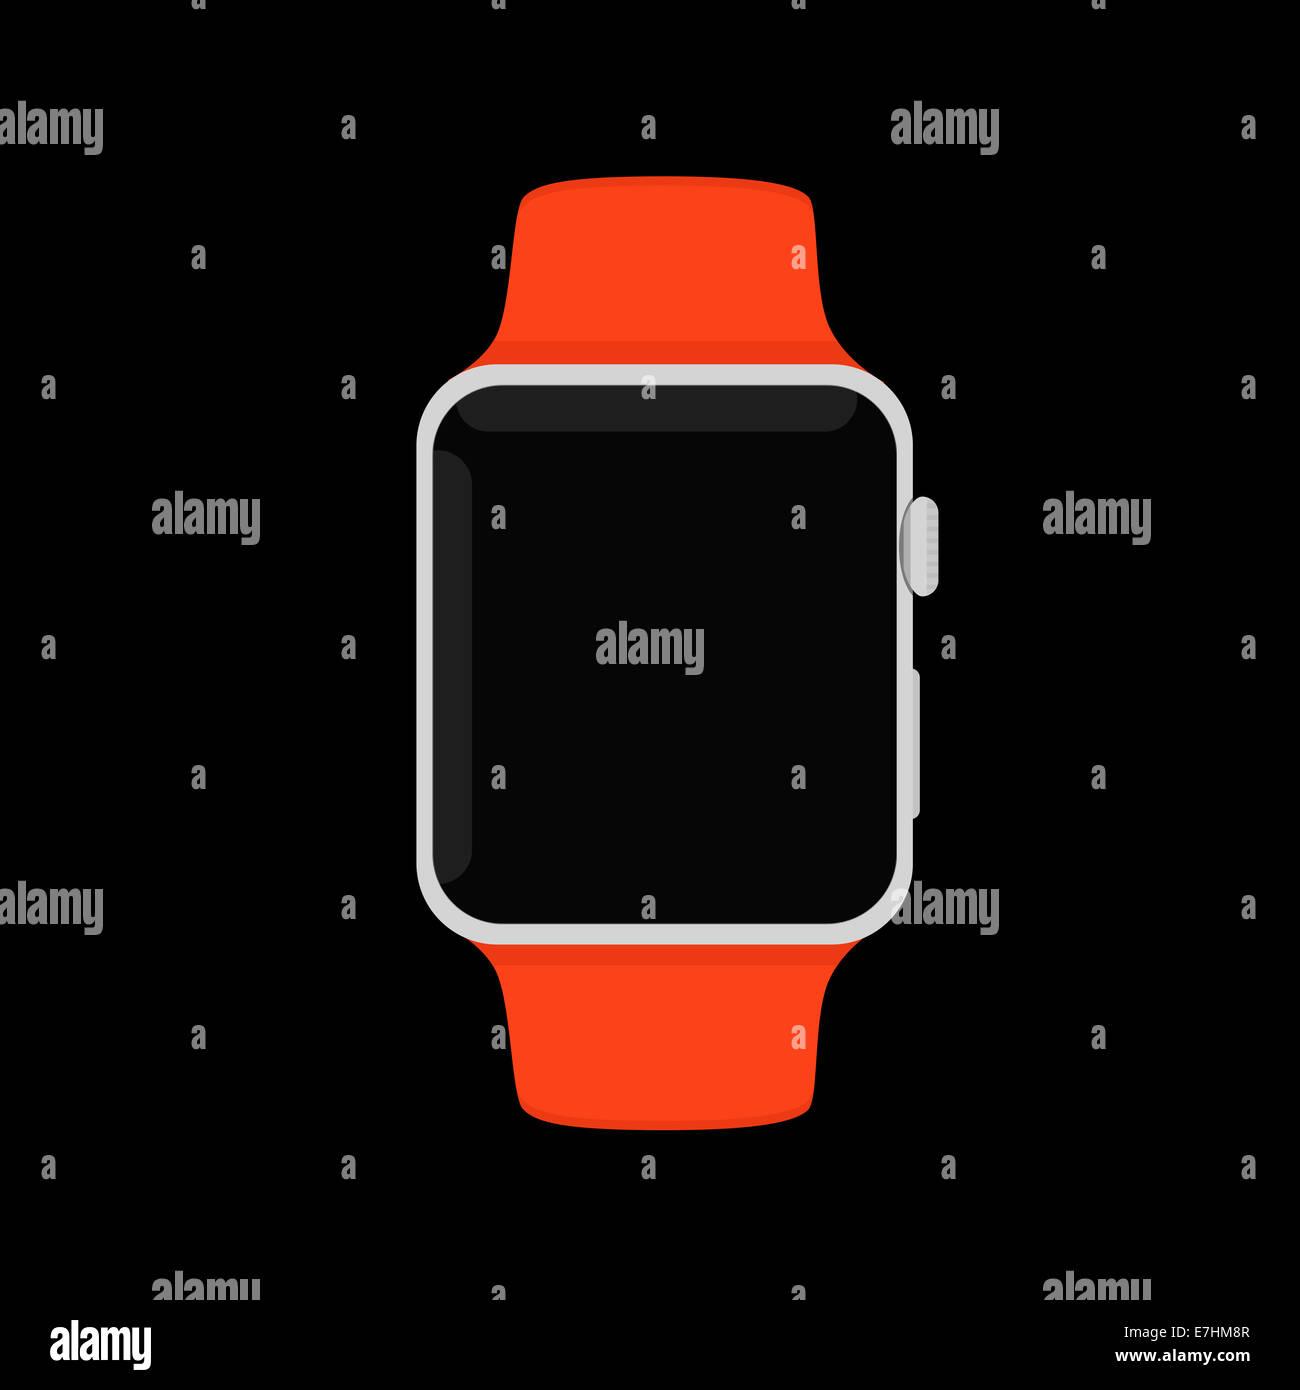 Red Apple Watch Sport, flat design illustration. - Stock Image